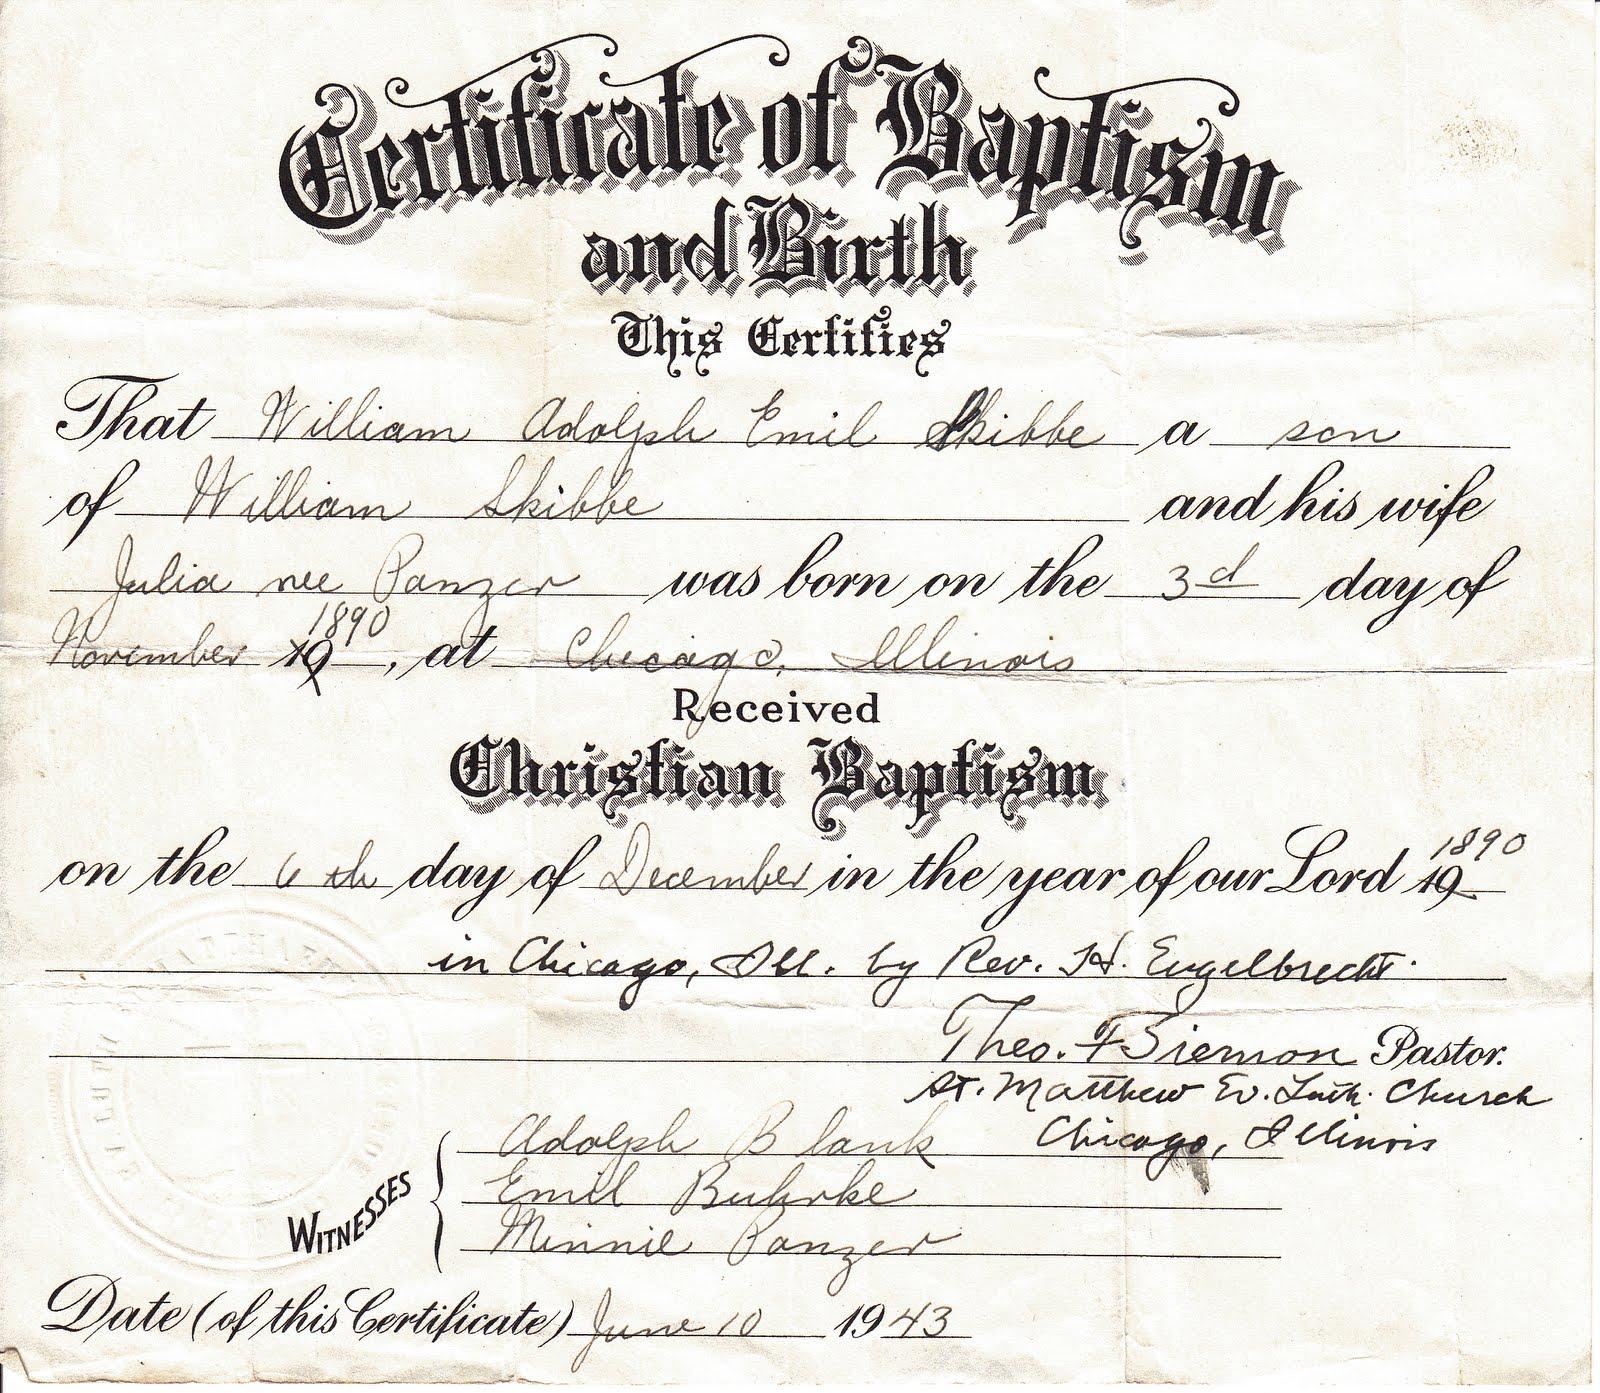 Treasure chest thursday certificate of baptism william skibbe xflitez Images